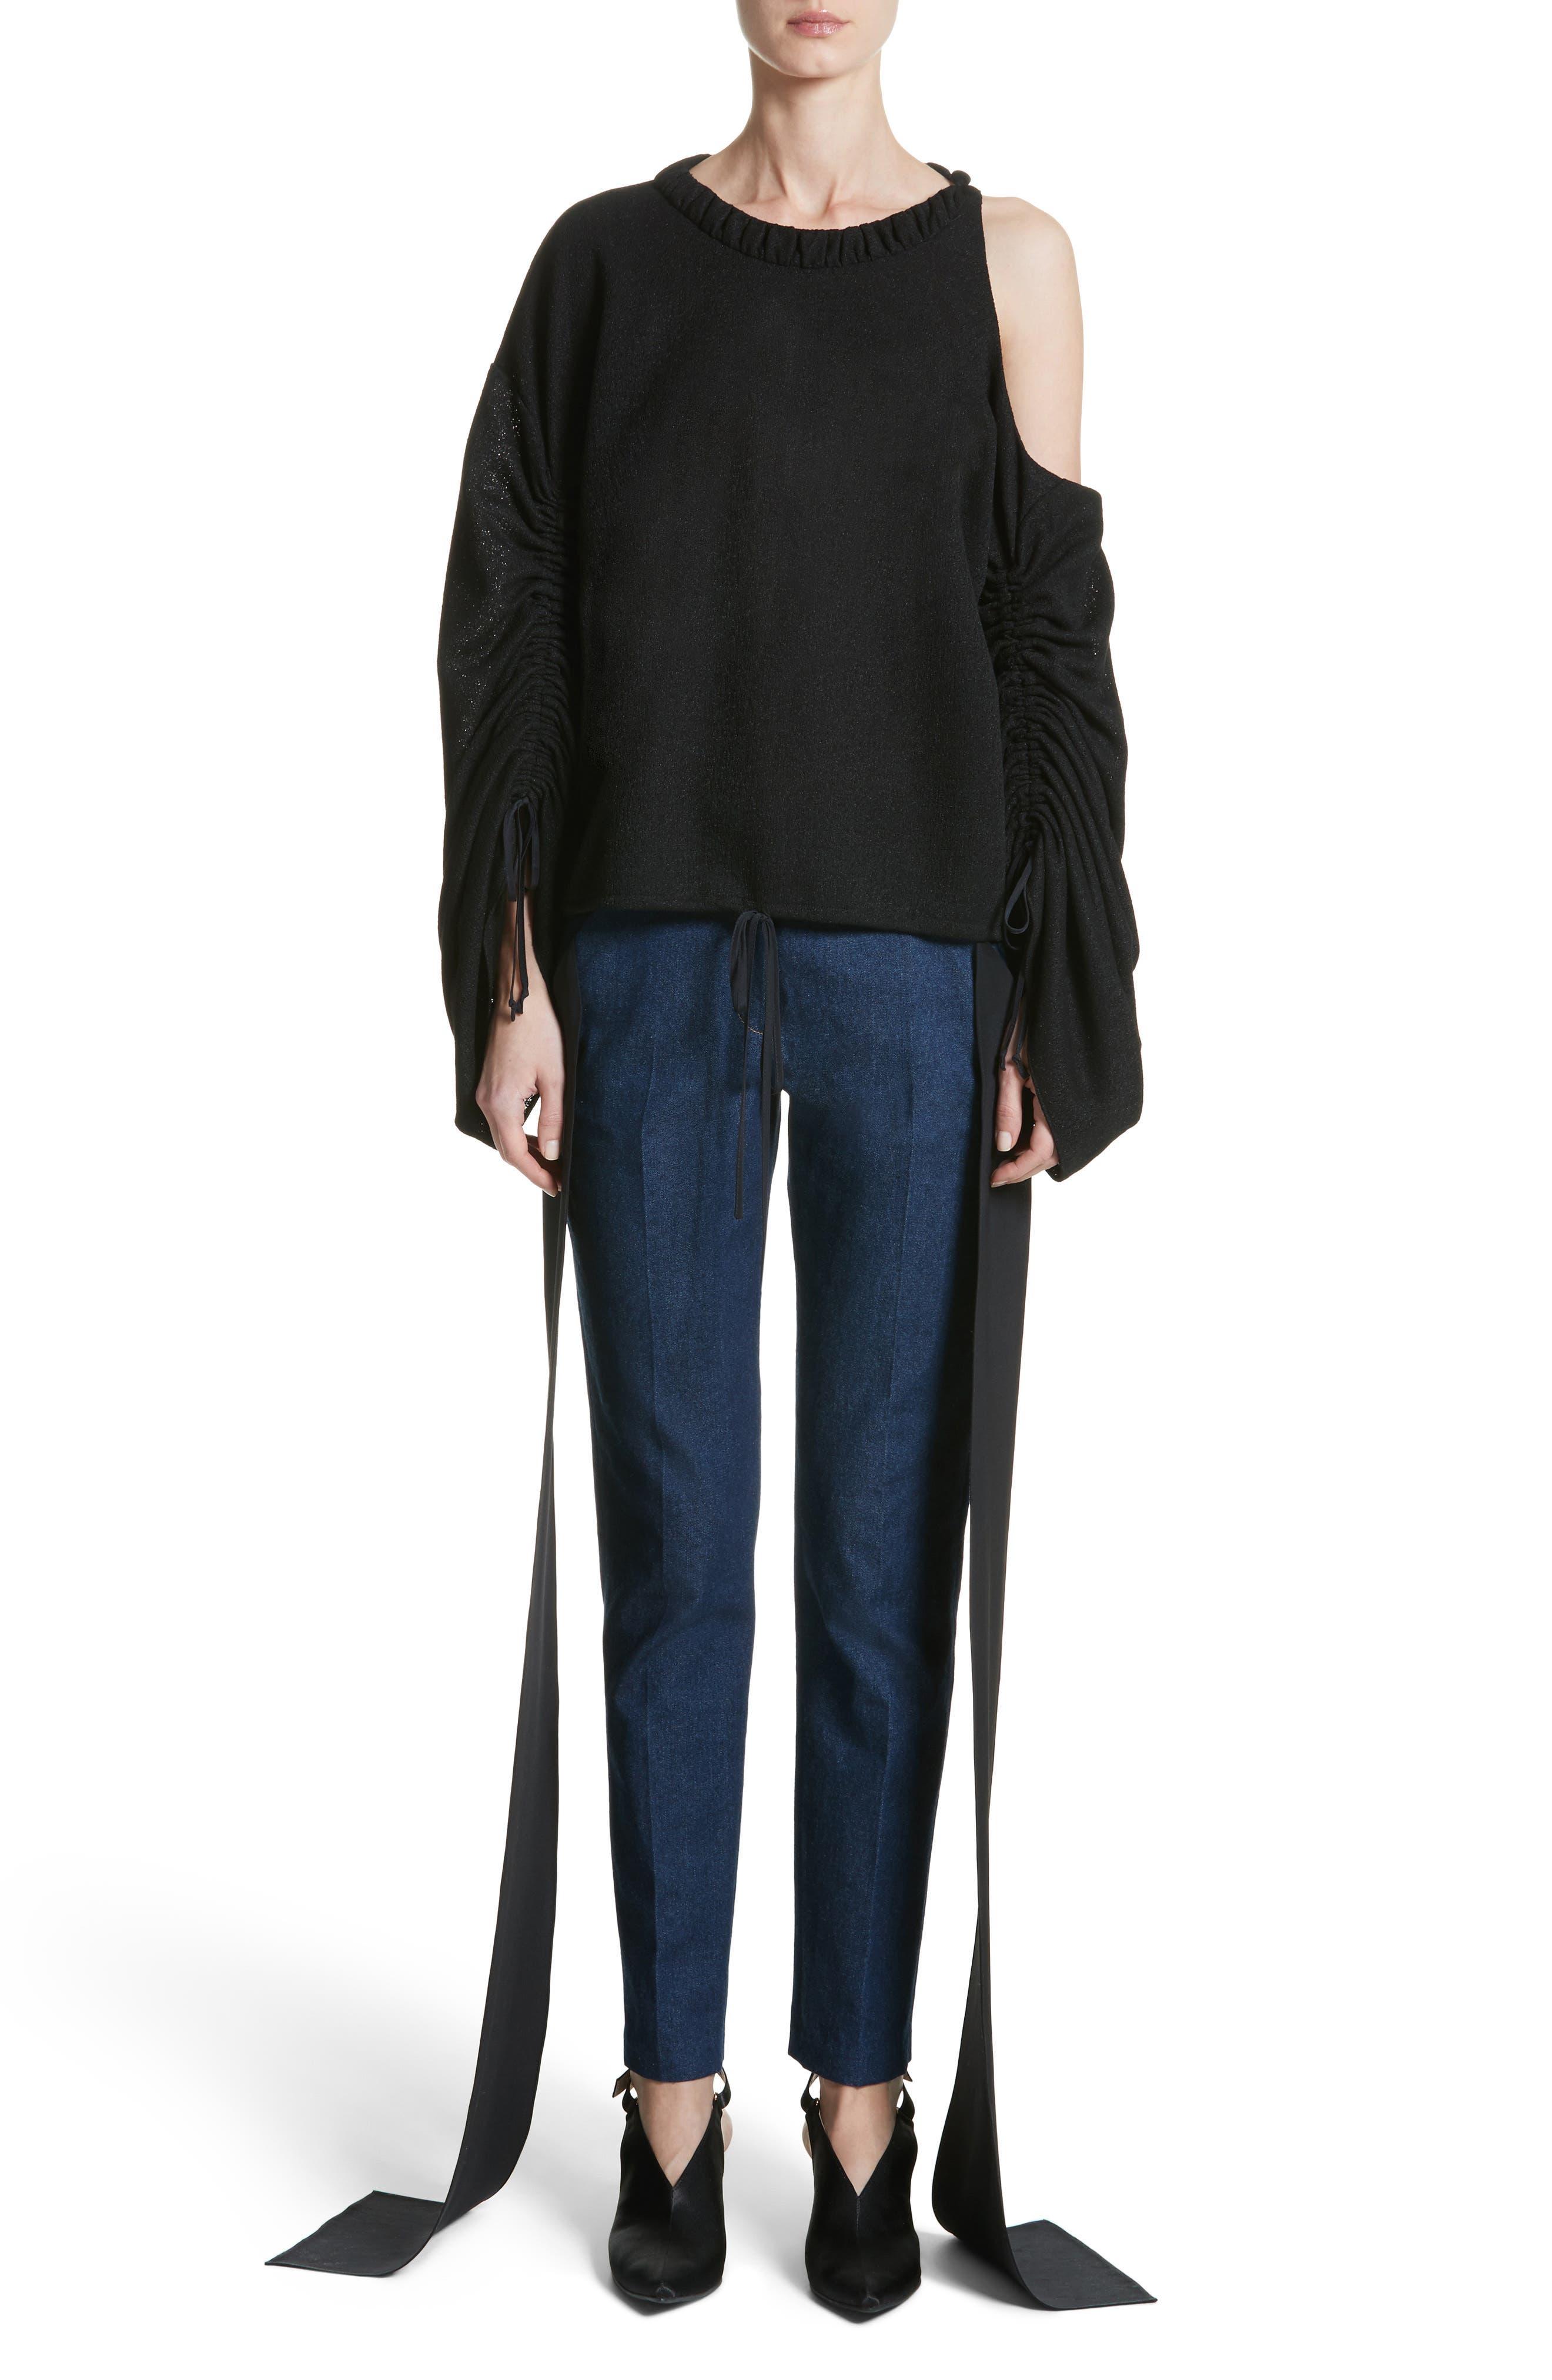 Mojave Side Panel Skinny Jeans,                             Alternate thumbnail 9, color,                             Dark Wash Denim